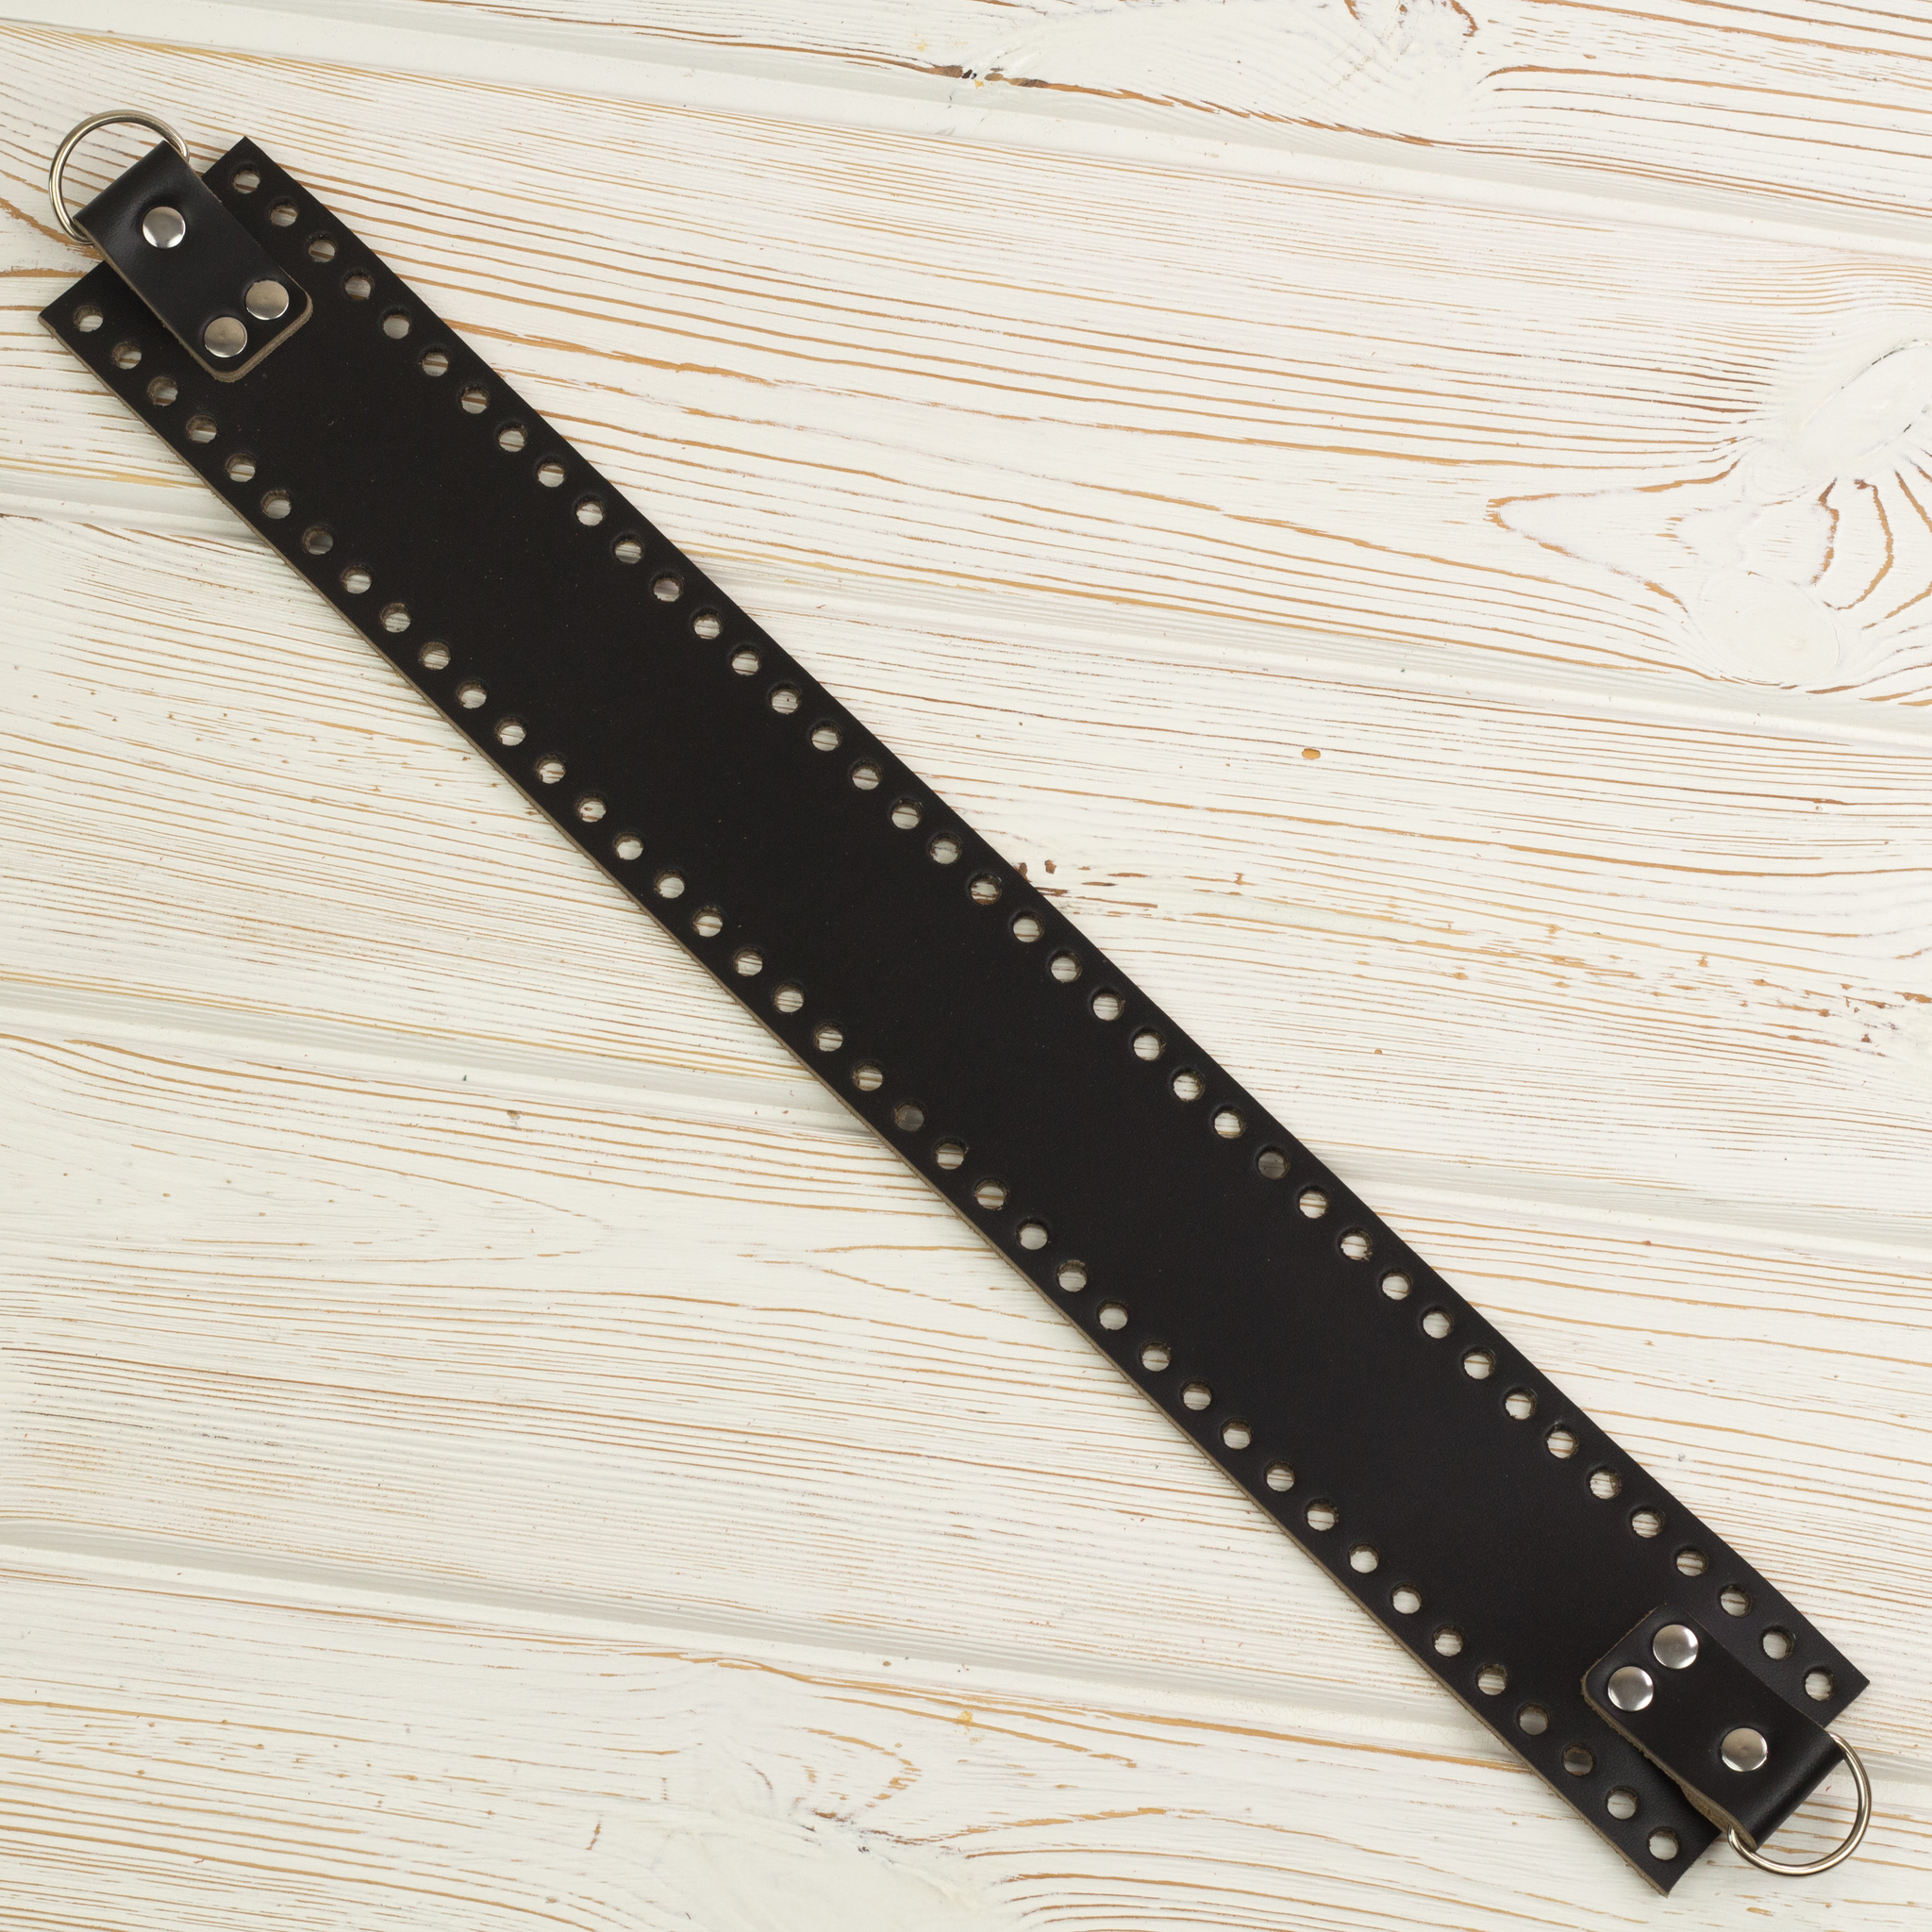 Вся фурнитура Боковая часть для сумки черная узкая 4мм IMG_3936.JPG